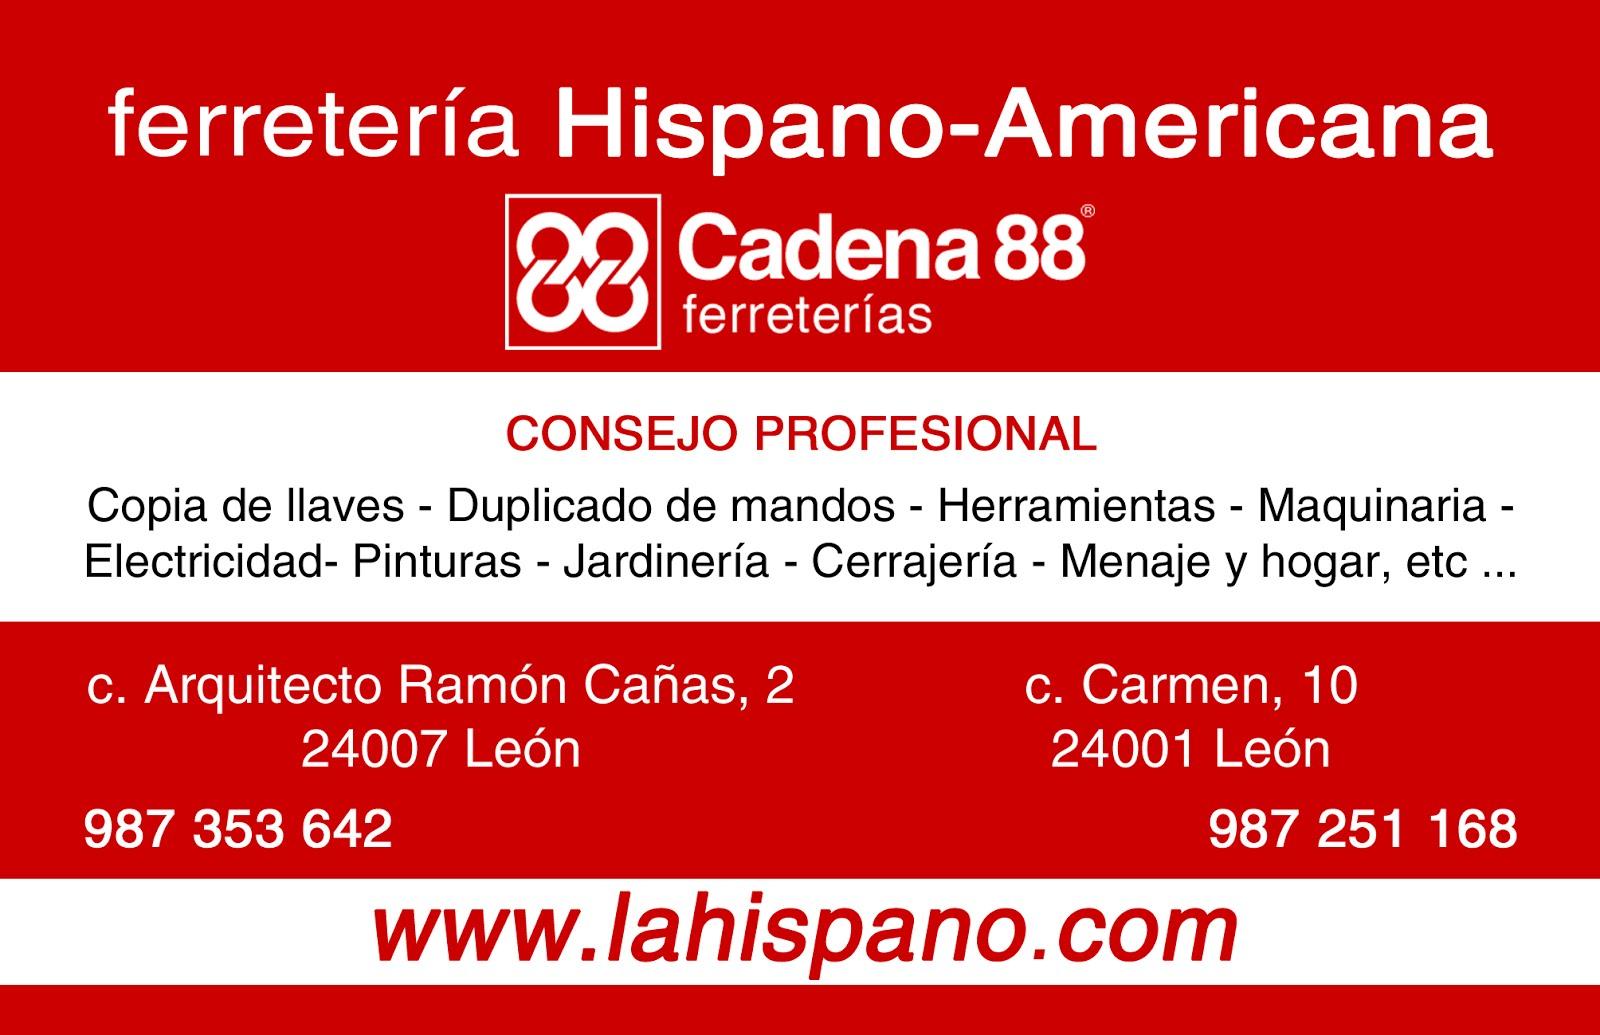 Ferretería Hispano-Americana